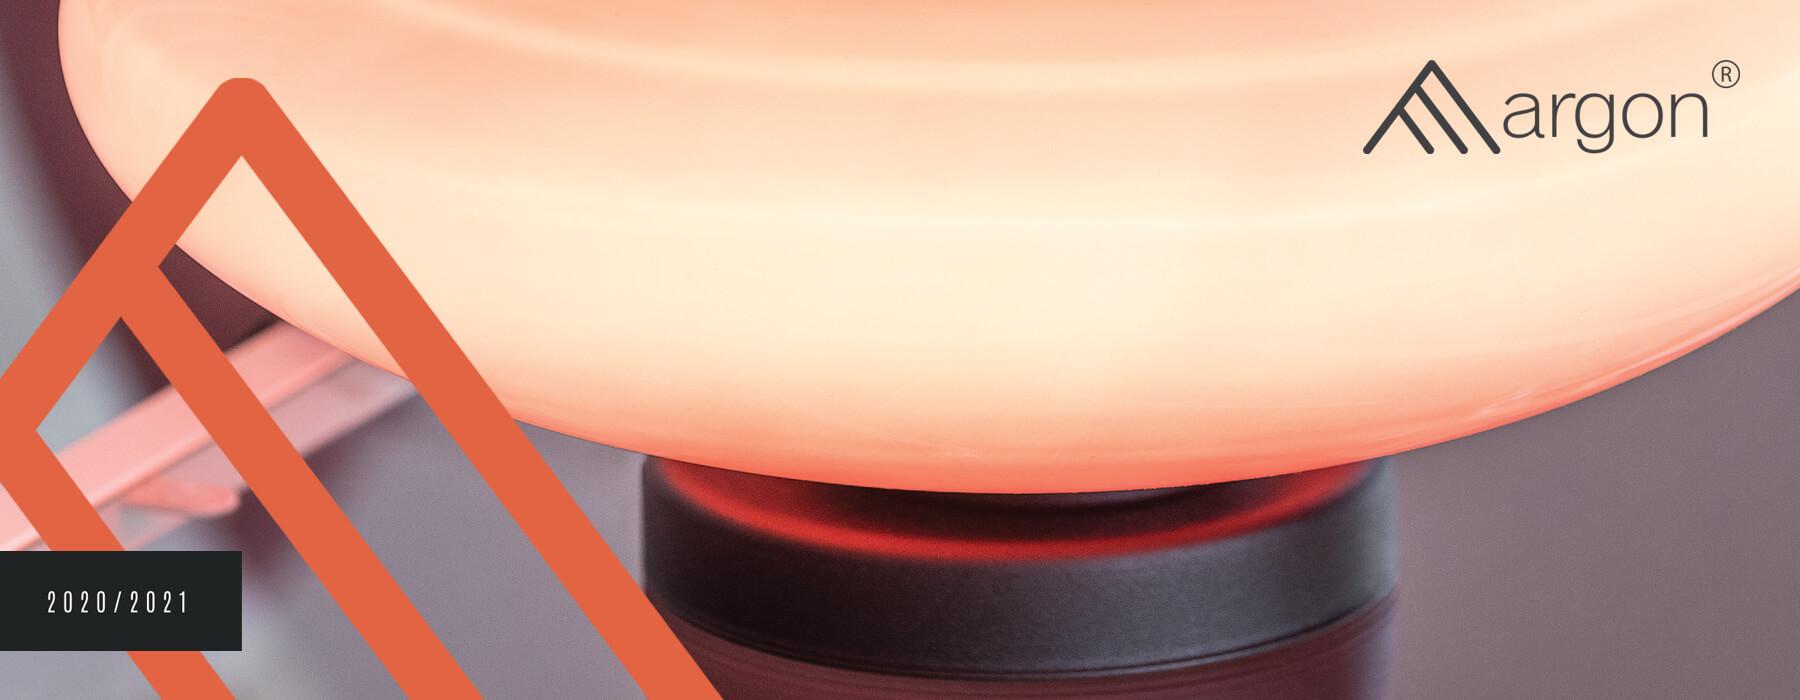 Producent Oświetlenia Producent Lamp Argon Lampy